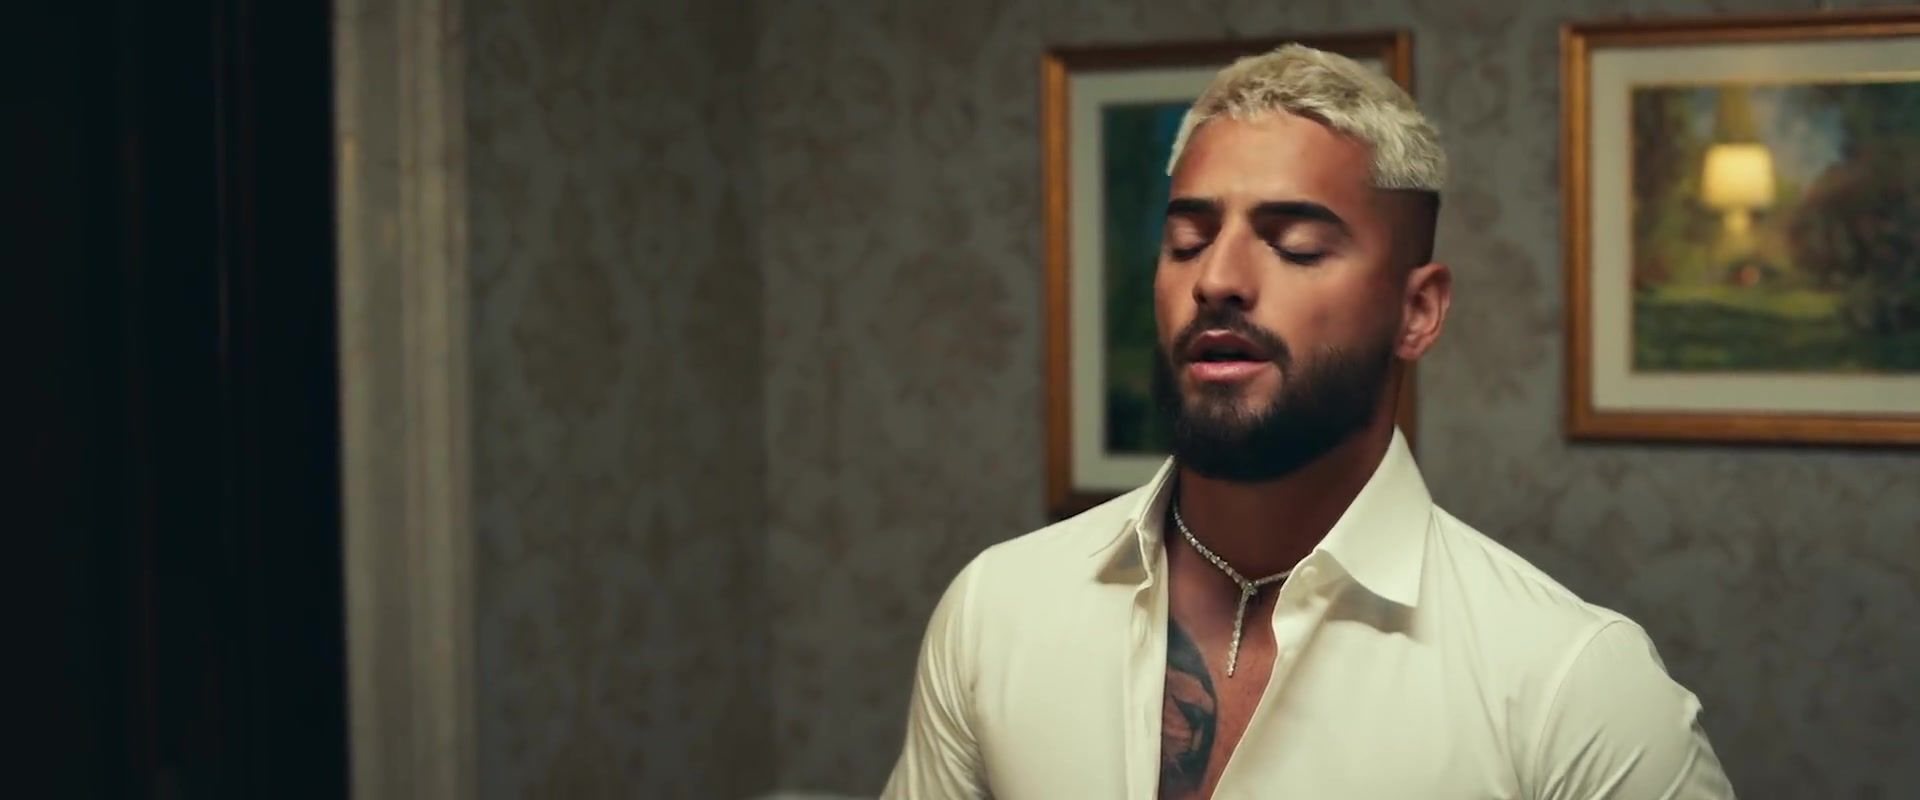 Que Pena By Maluma And J Balvin Latin Music Video Outfits In 2020 Music Video Outfit Latin Music Music Videos